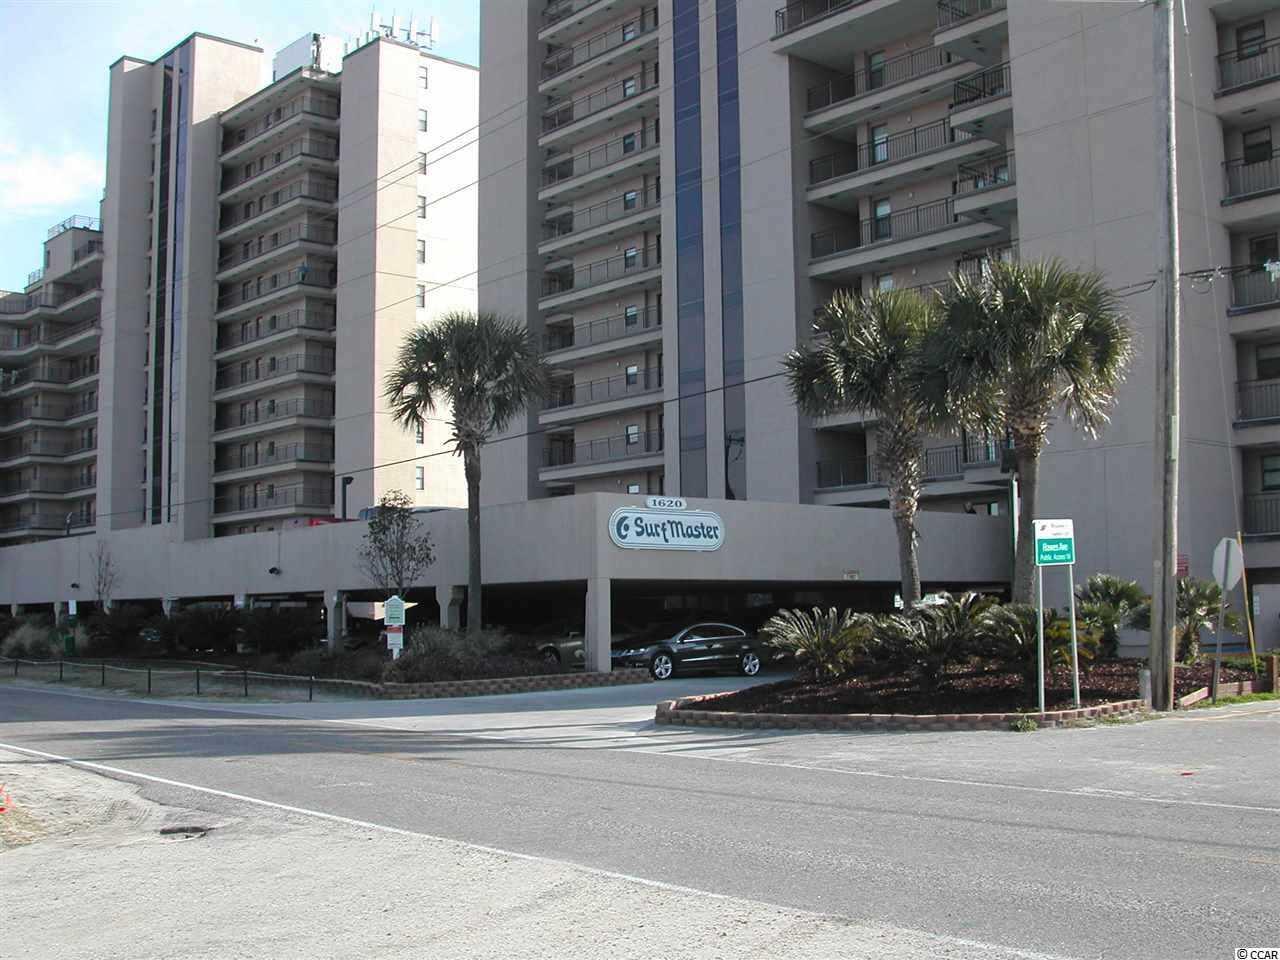 1620 N Waccamaw Drive #314 Garden City Beach, SC 29576 | MLS 1800418 Photo 1